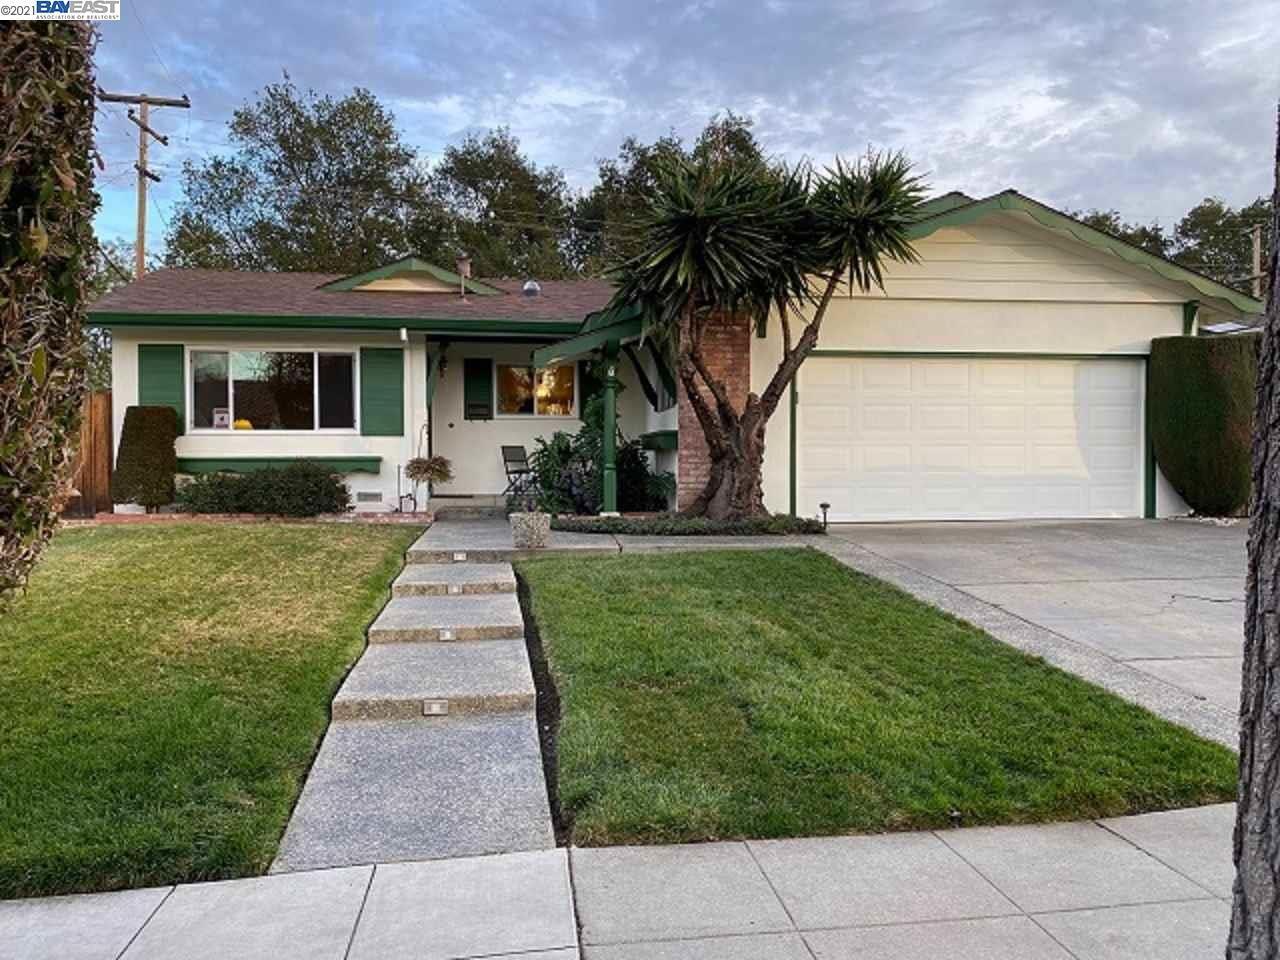 Photo for 1194 Arlington Lane, SAN JOSE, CA 95129-3740 (MLS # 40935350)